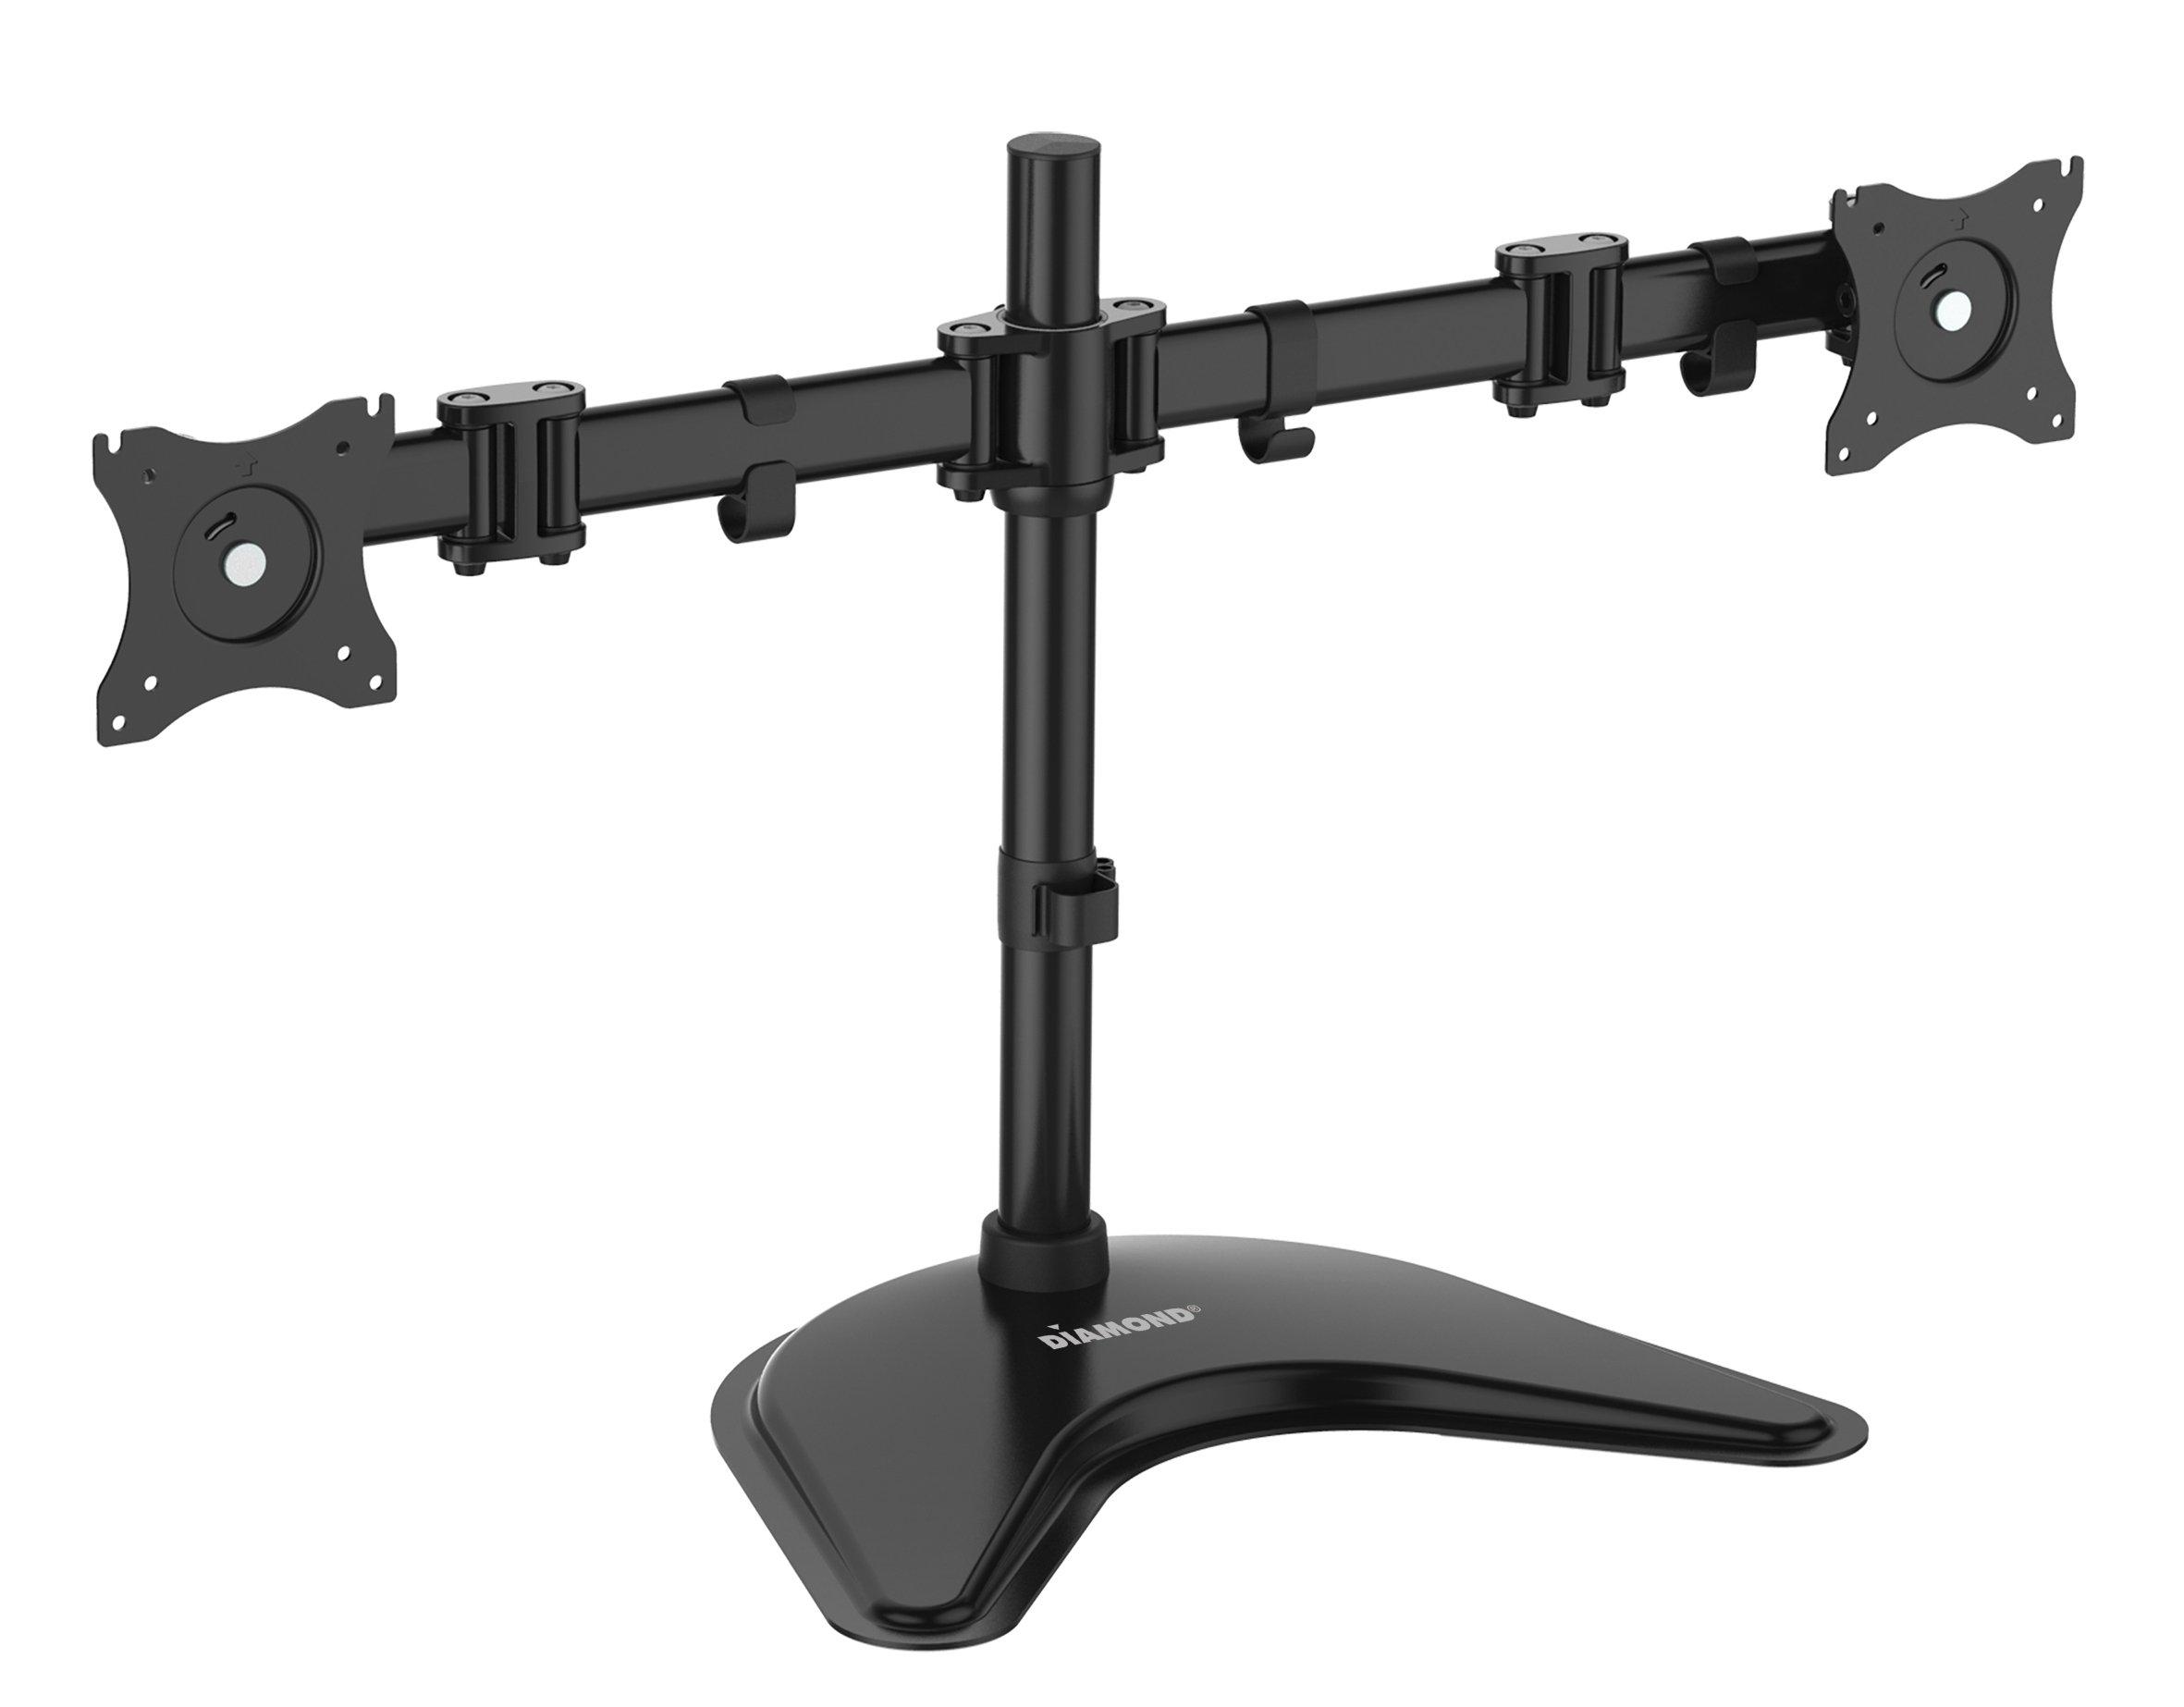 Diamond Multimedia ARMTT2 Ergonomic Articulating Dual Arm Display Table Top Mount